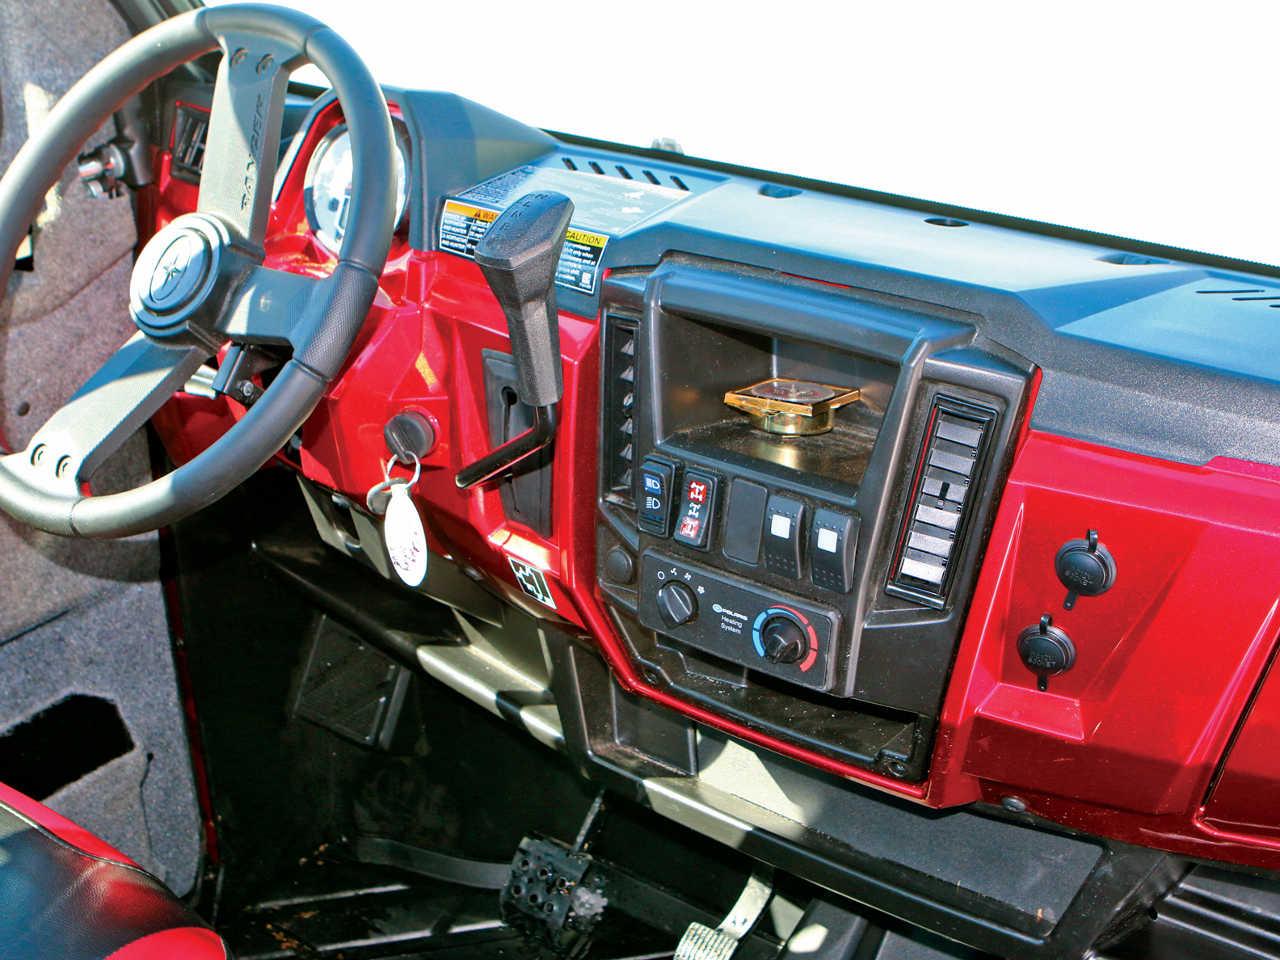 Ride Review The 2015 Polaris Ranger Xp 900 Atv Illustrated